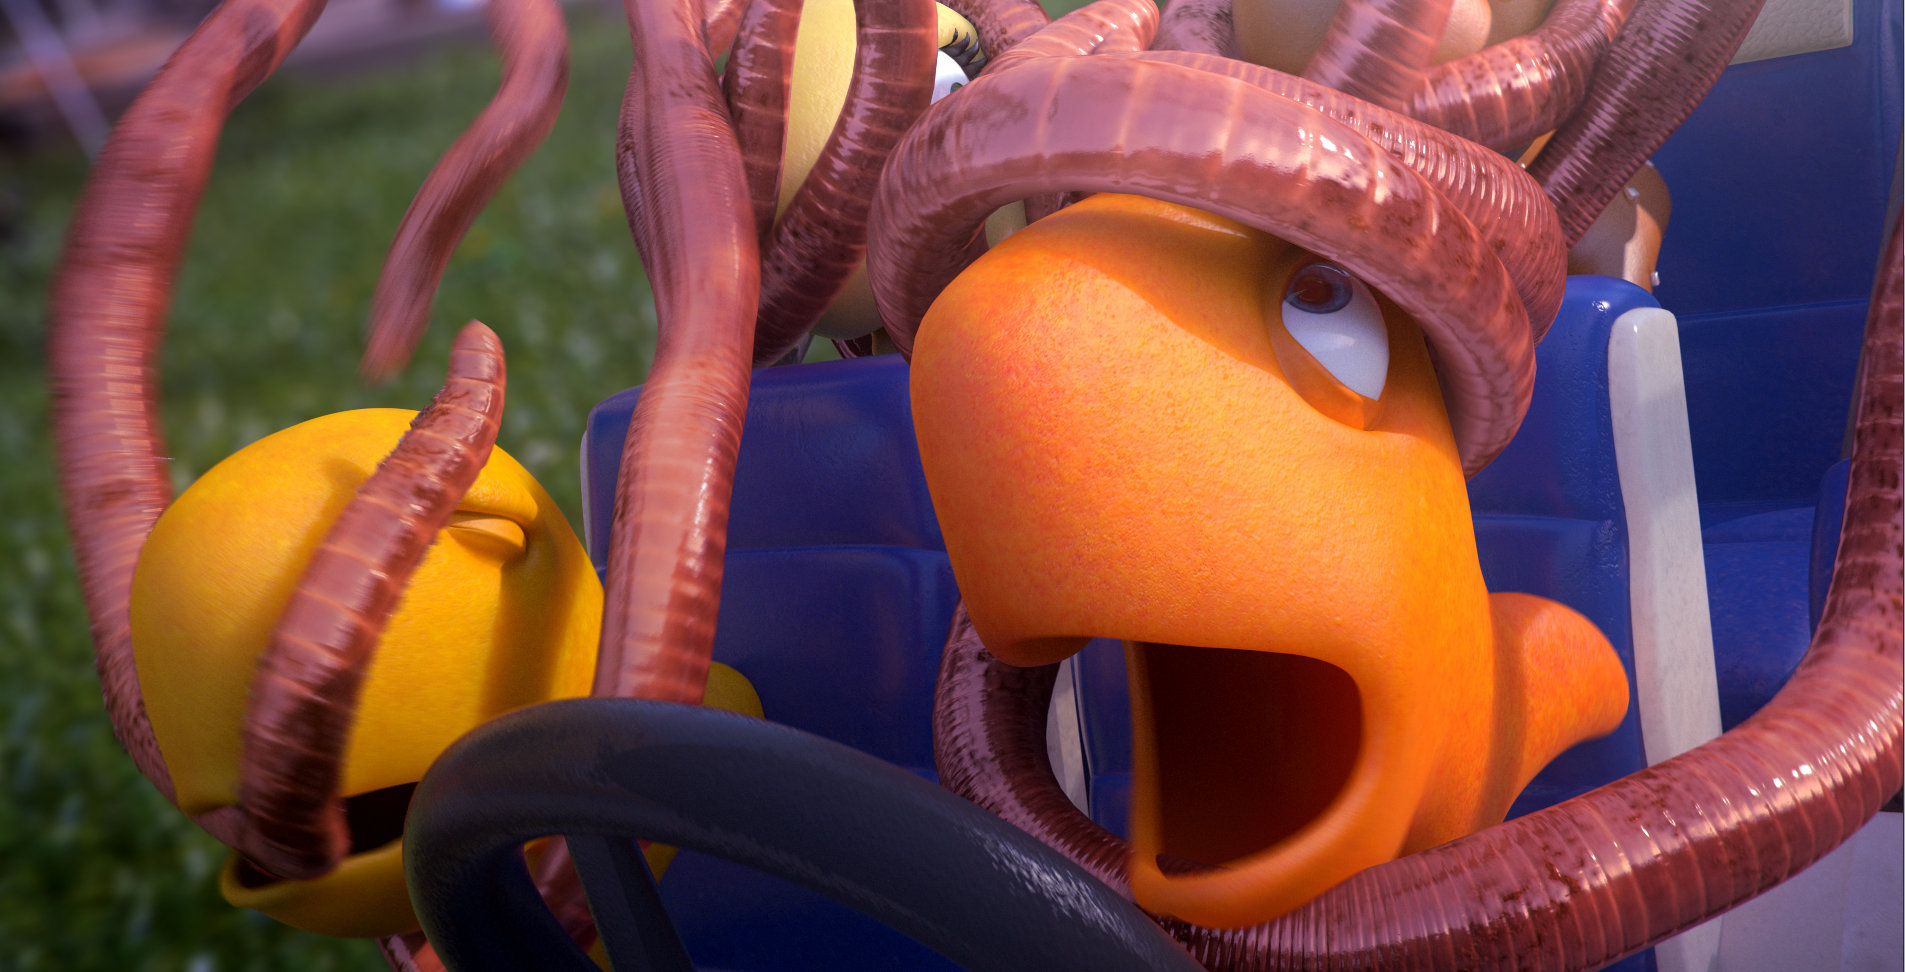 GoldFish_Worms_1.jpg